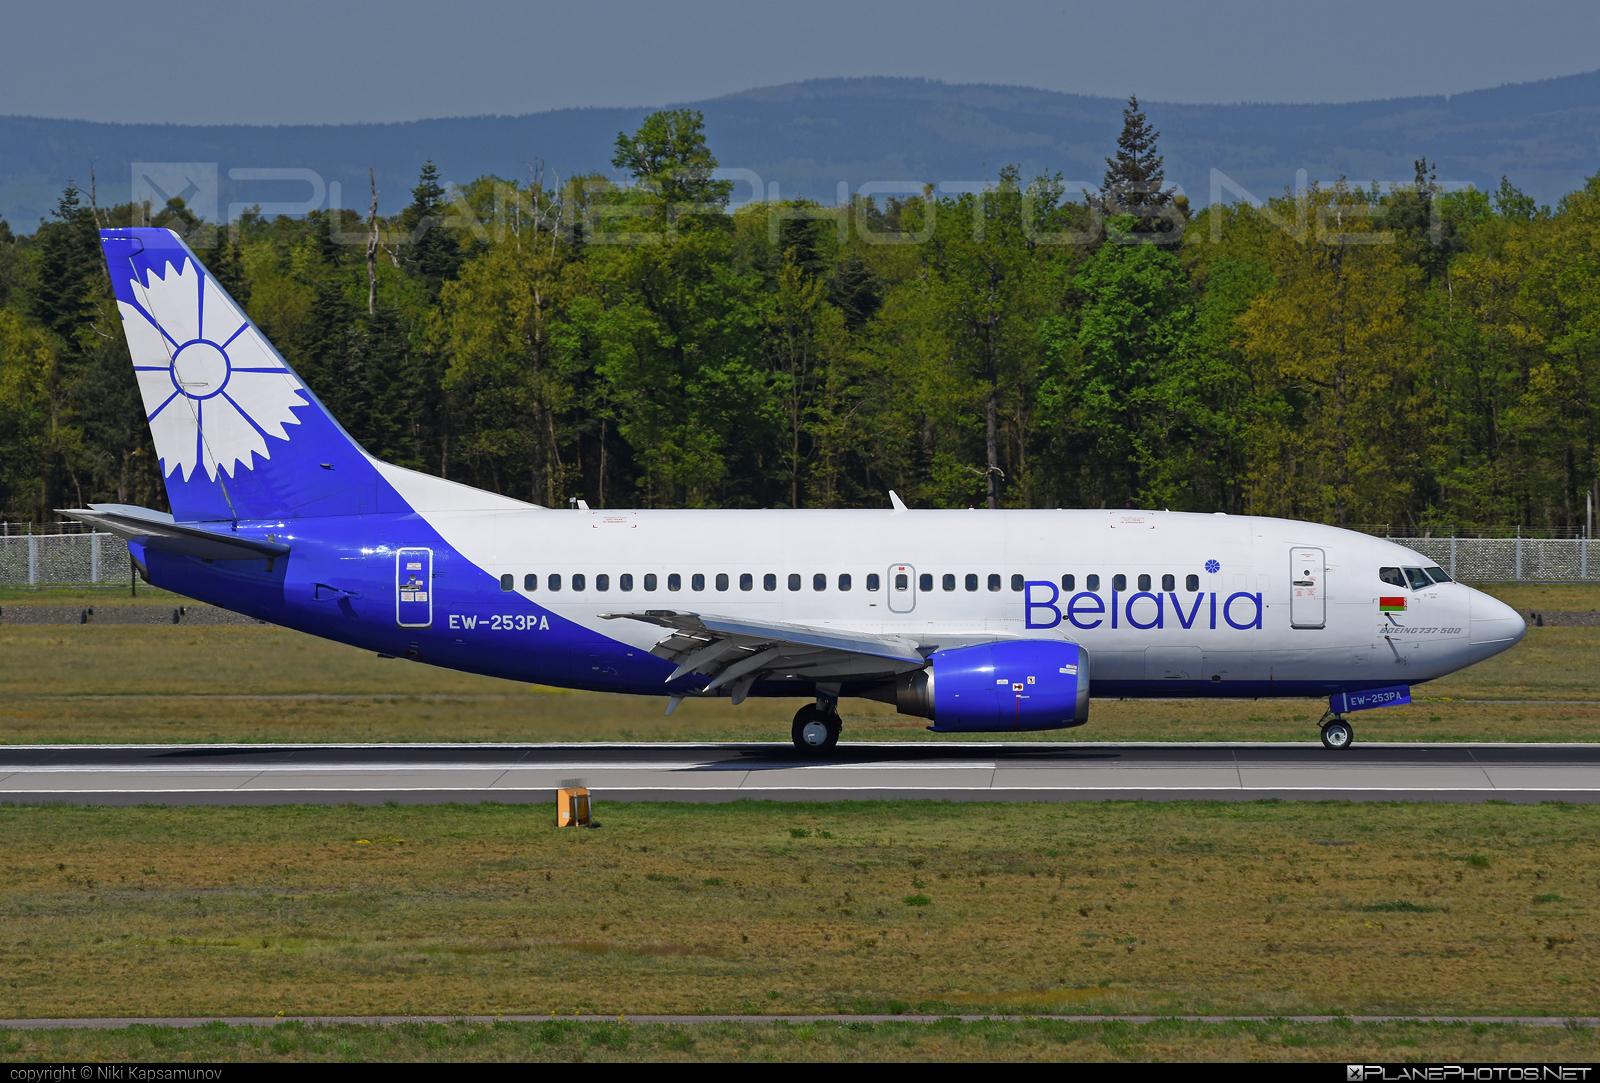 Belavia Belarusian Airlines Boeing 737-500 - EW-253PA #b737 #belavia #boeing #boeing737